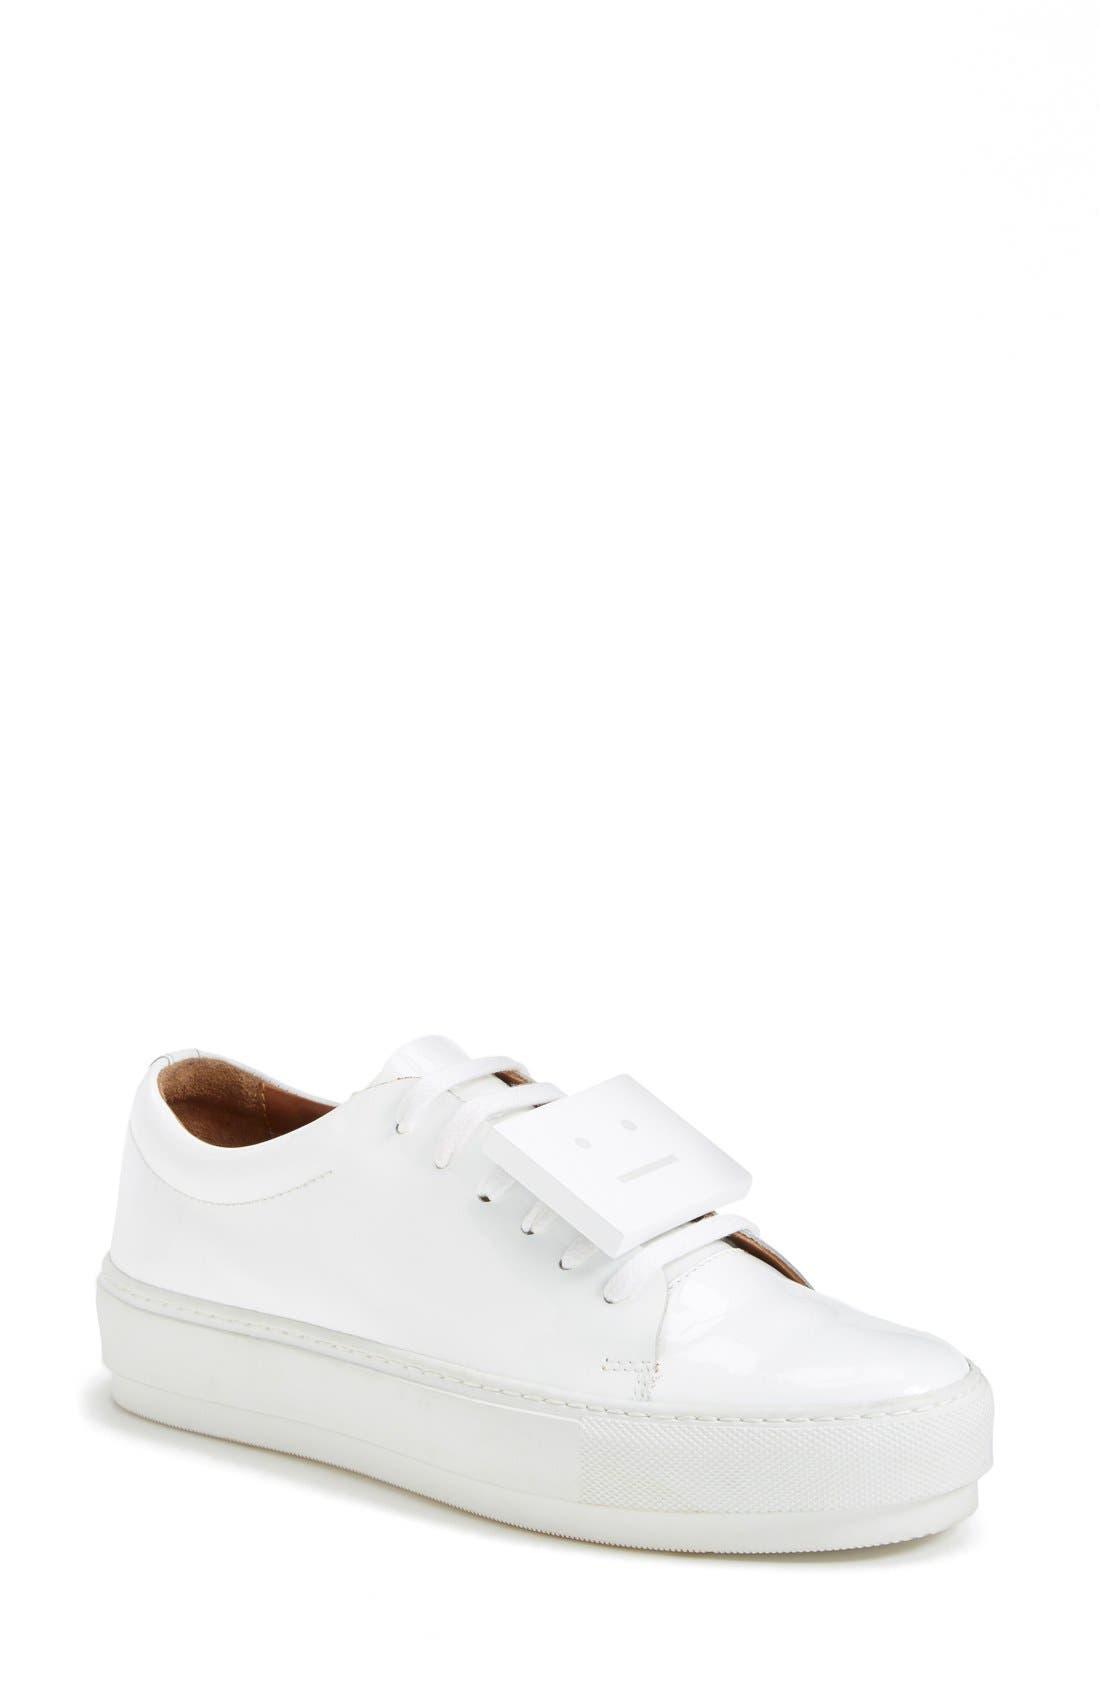 Acne Studios Adriana Leather Sneaker (Women)